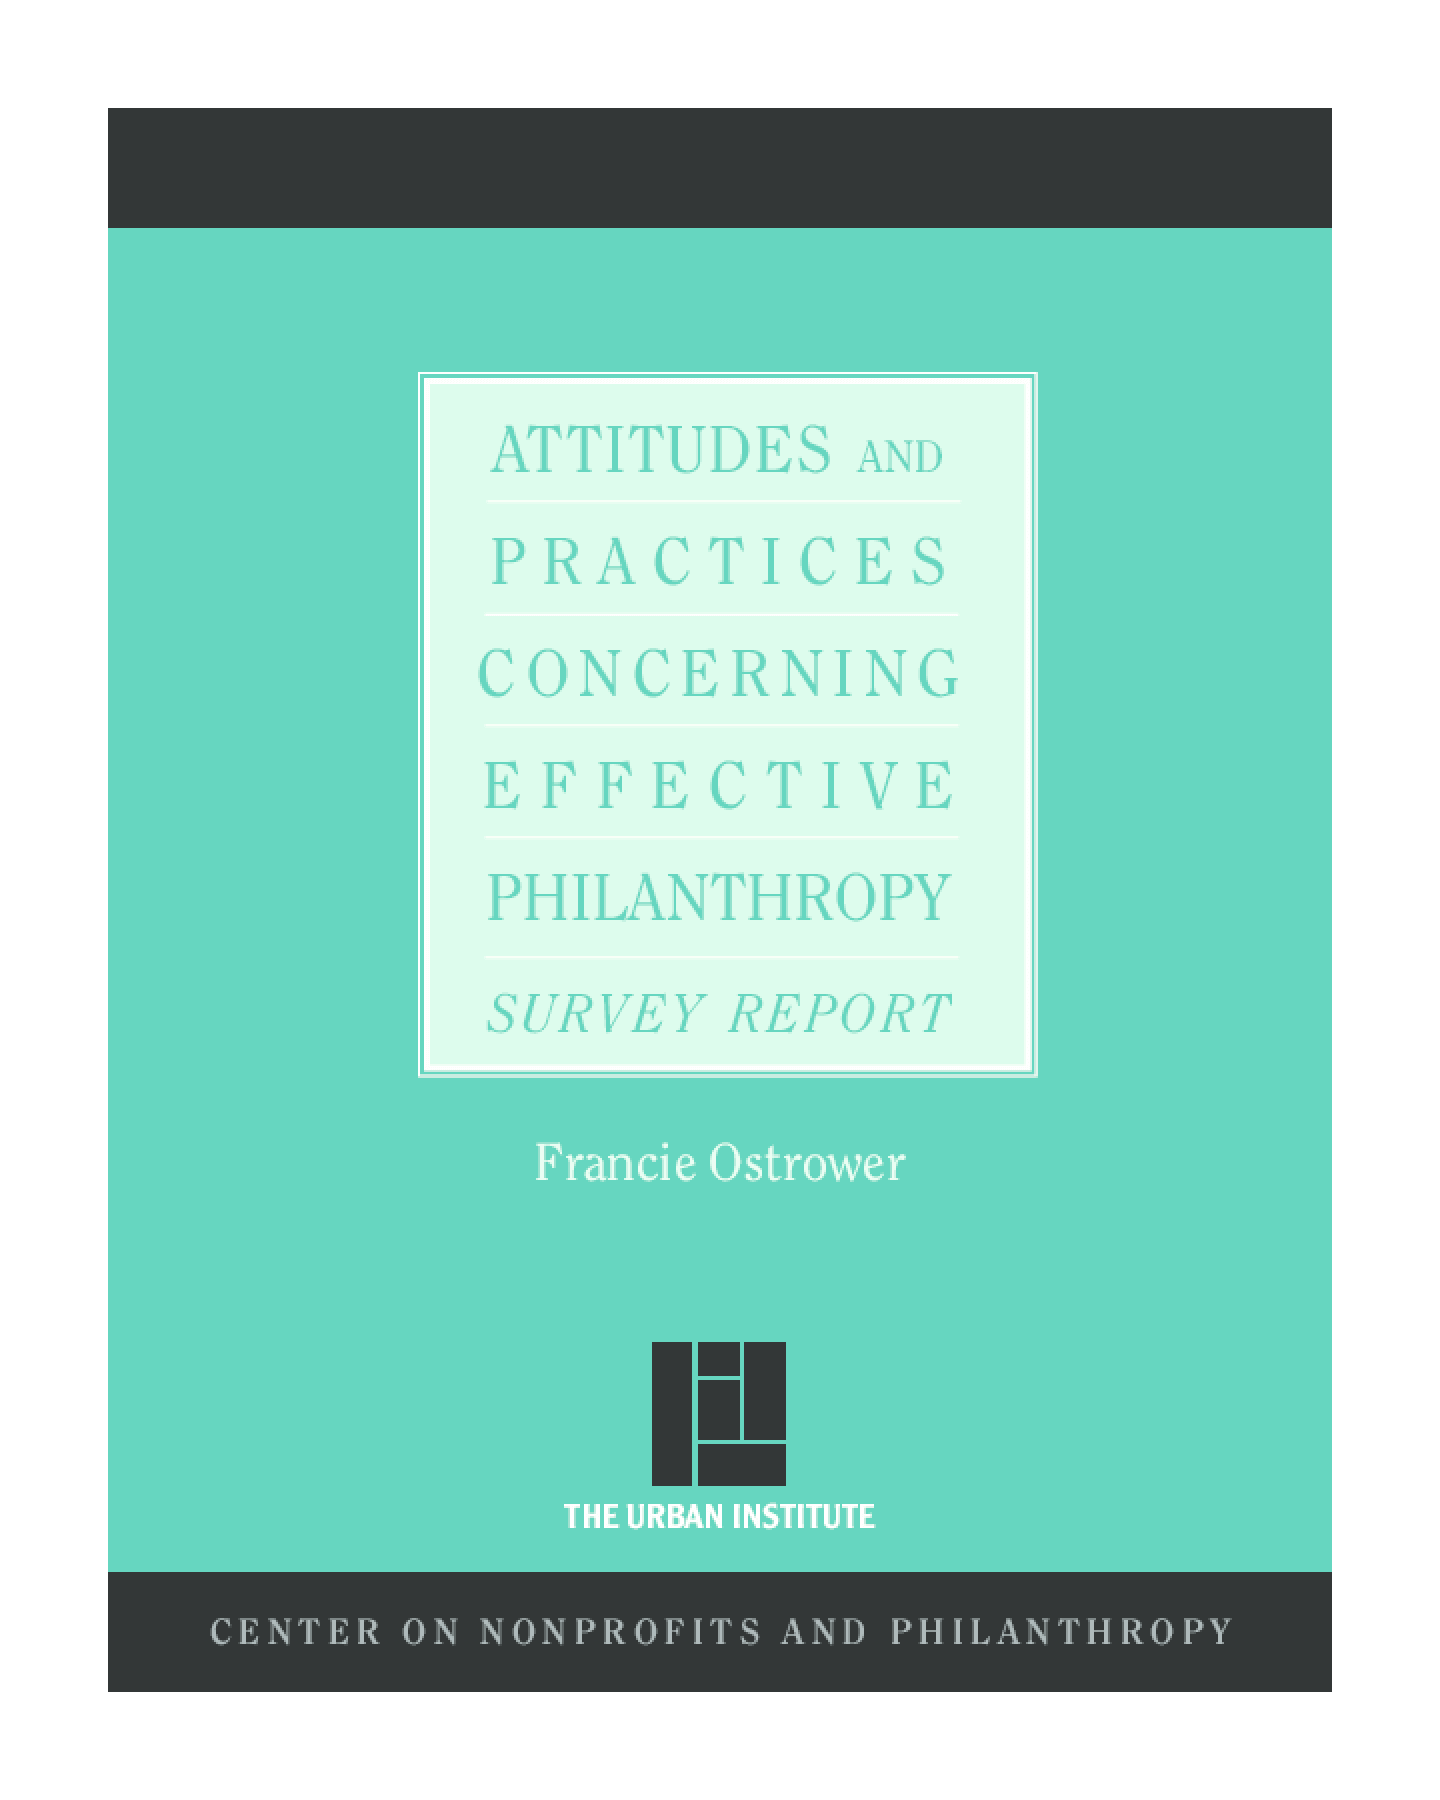 Attitudes and Practices Concerning Effective Philanthropy: Survey Report